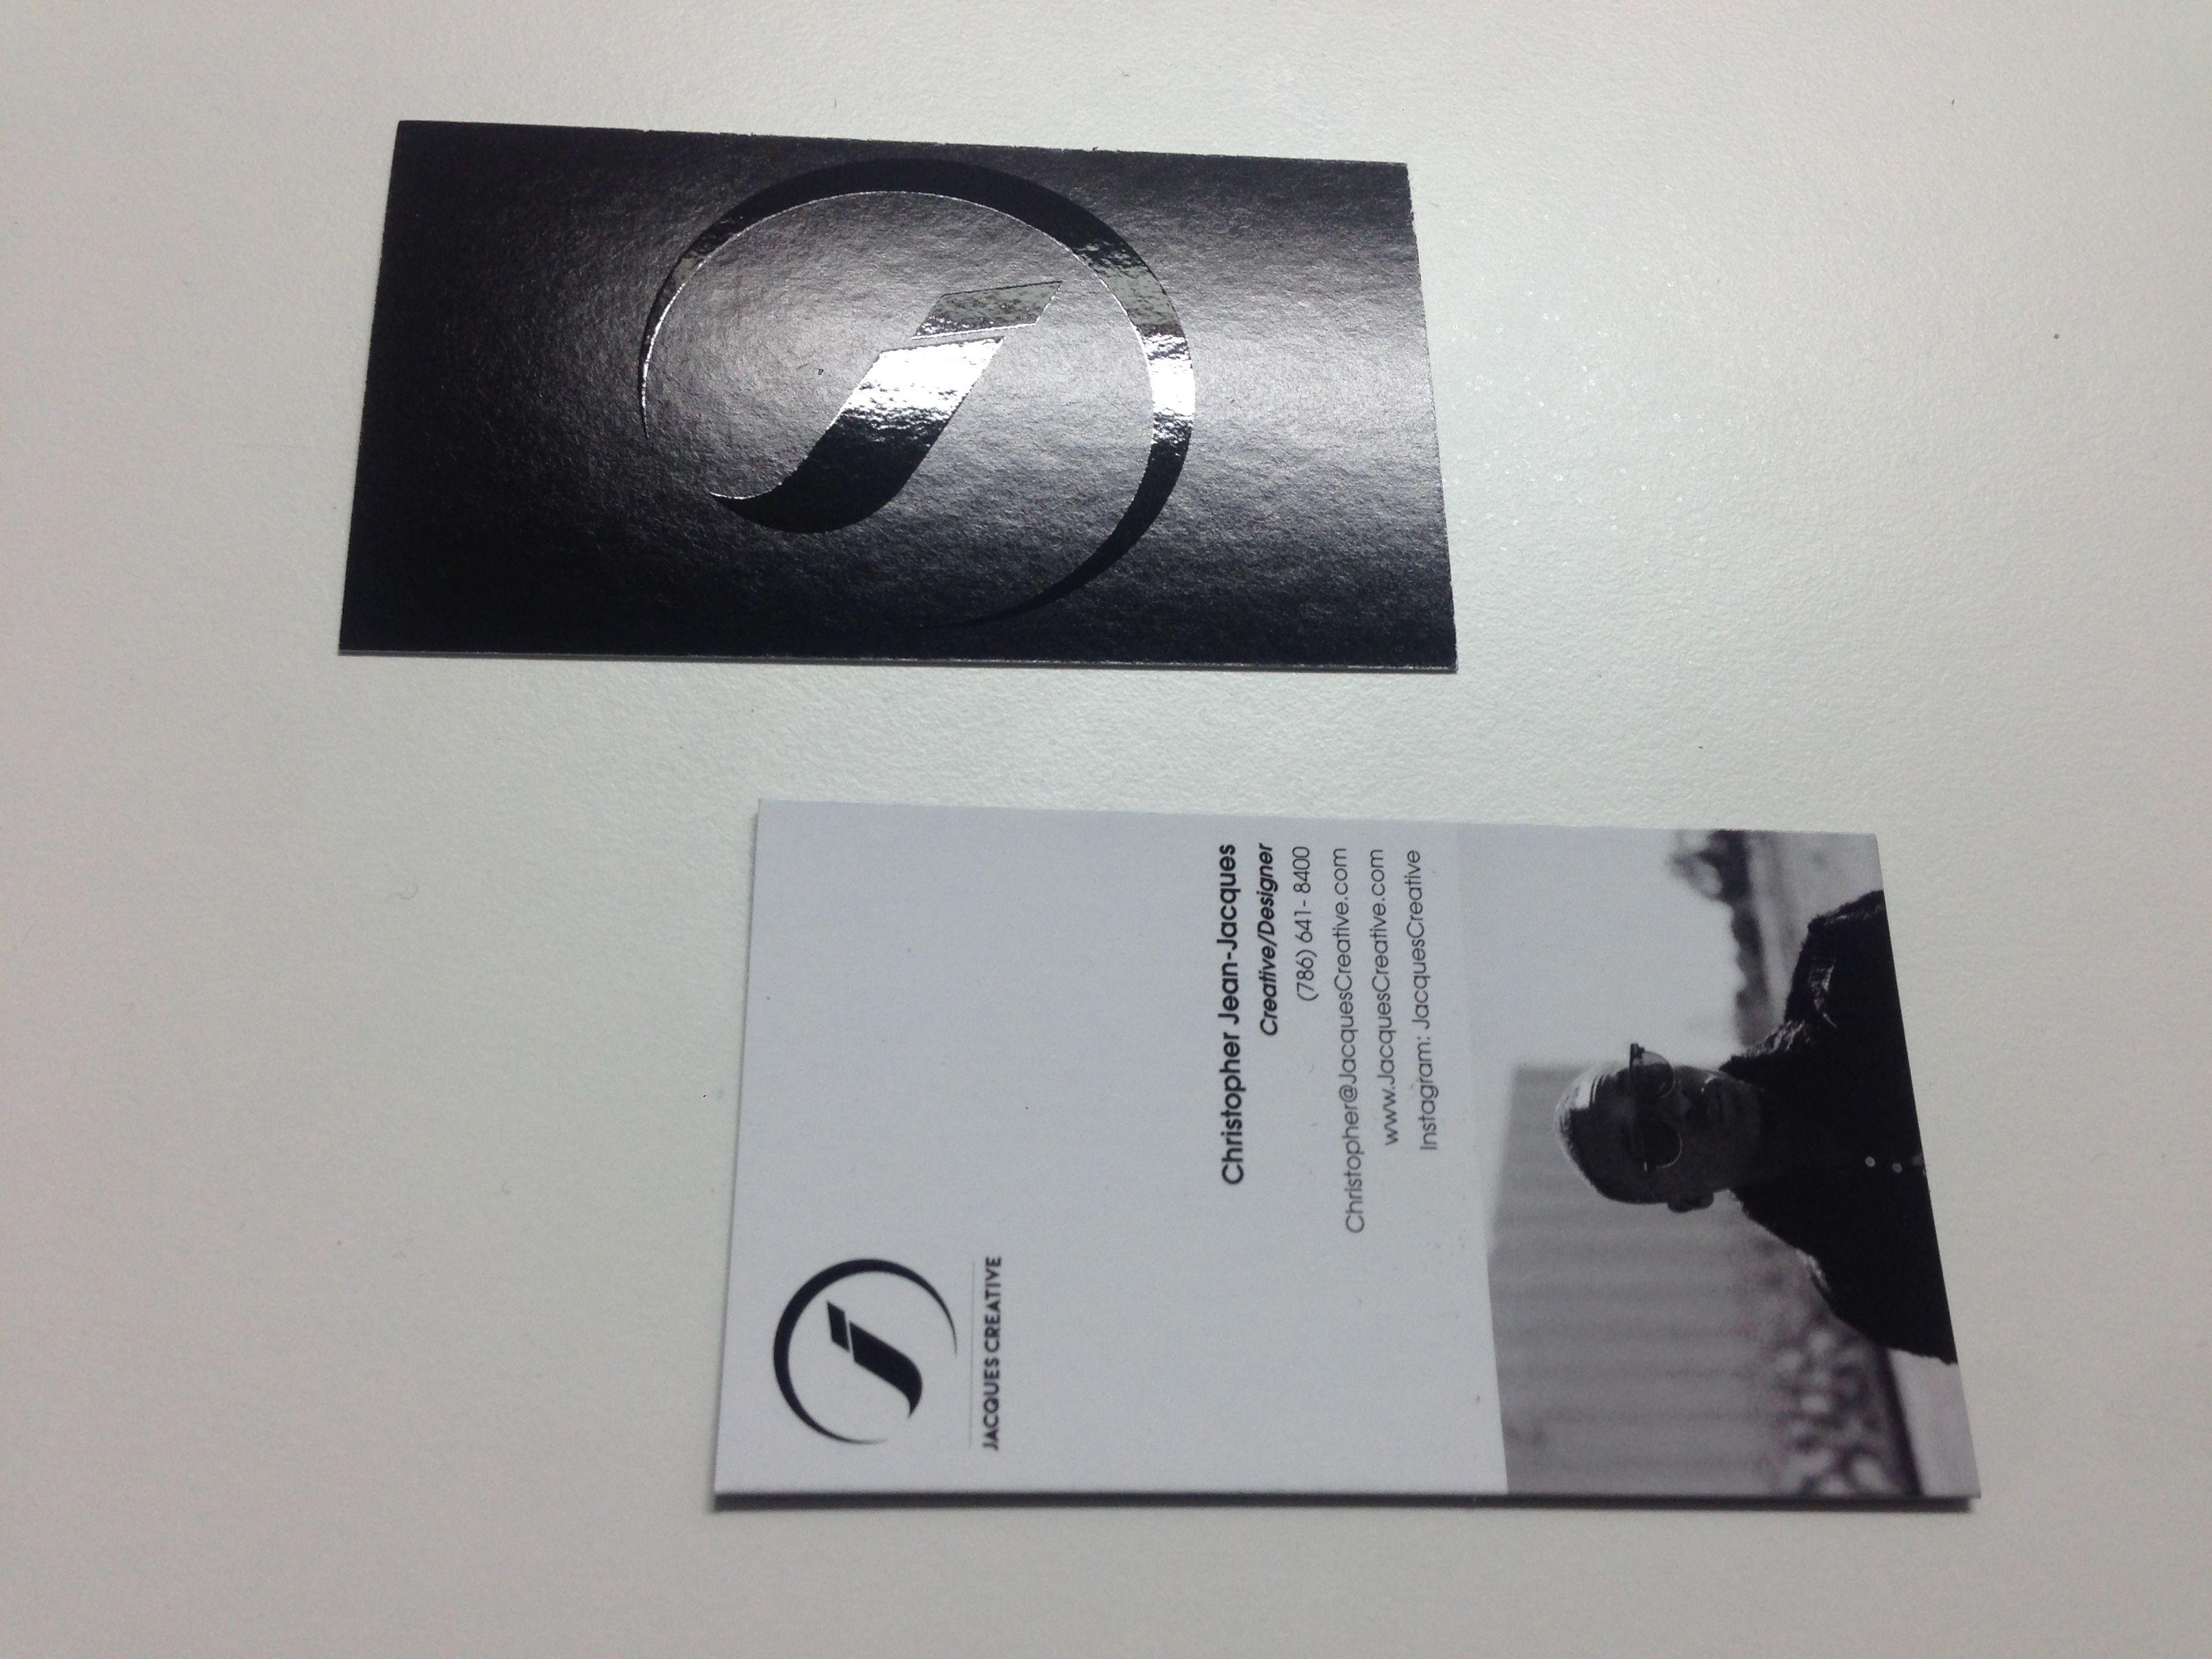 Spot UV Matte Finish Business Cards